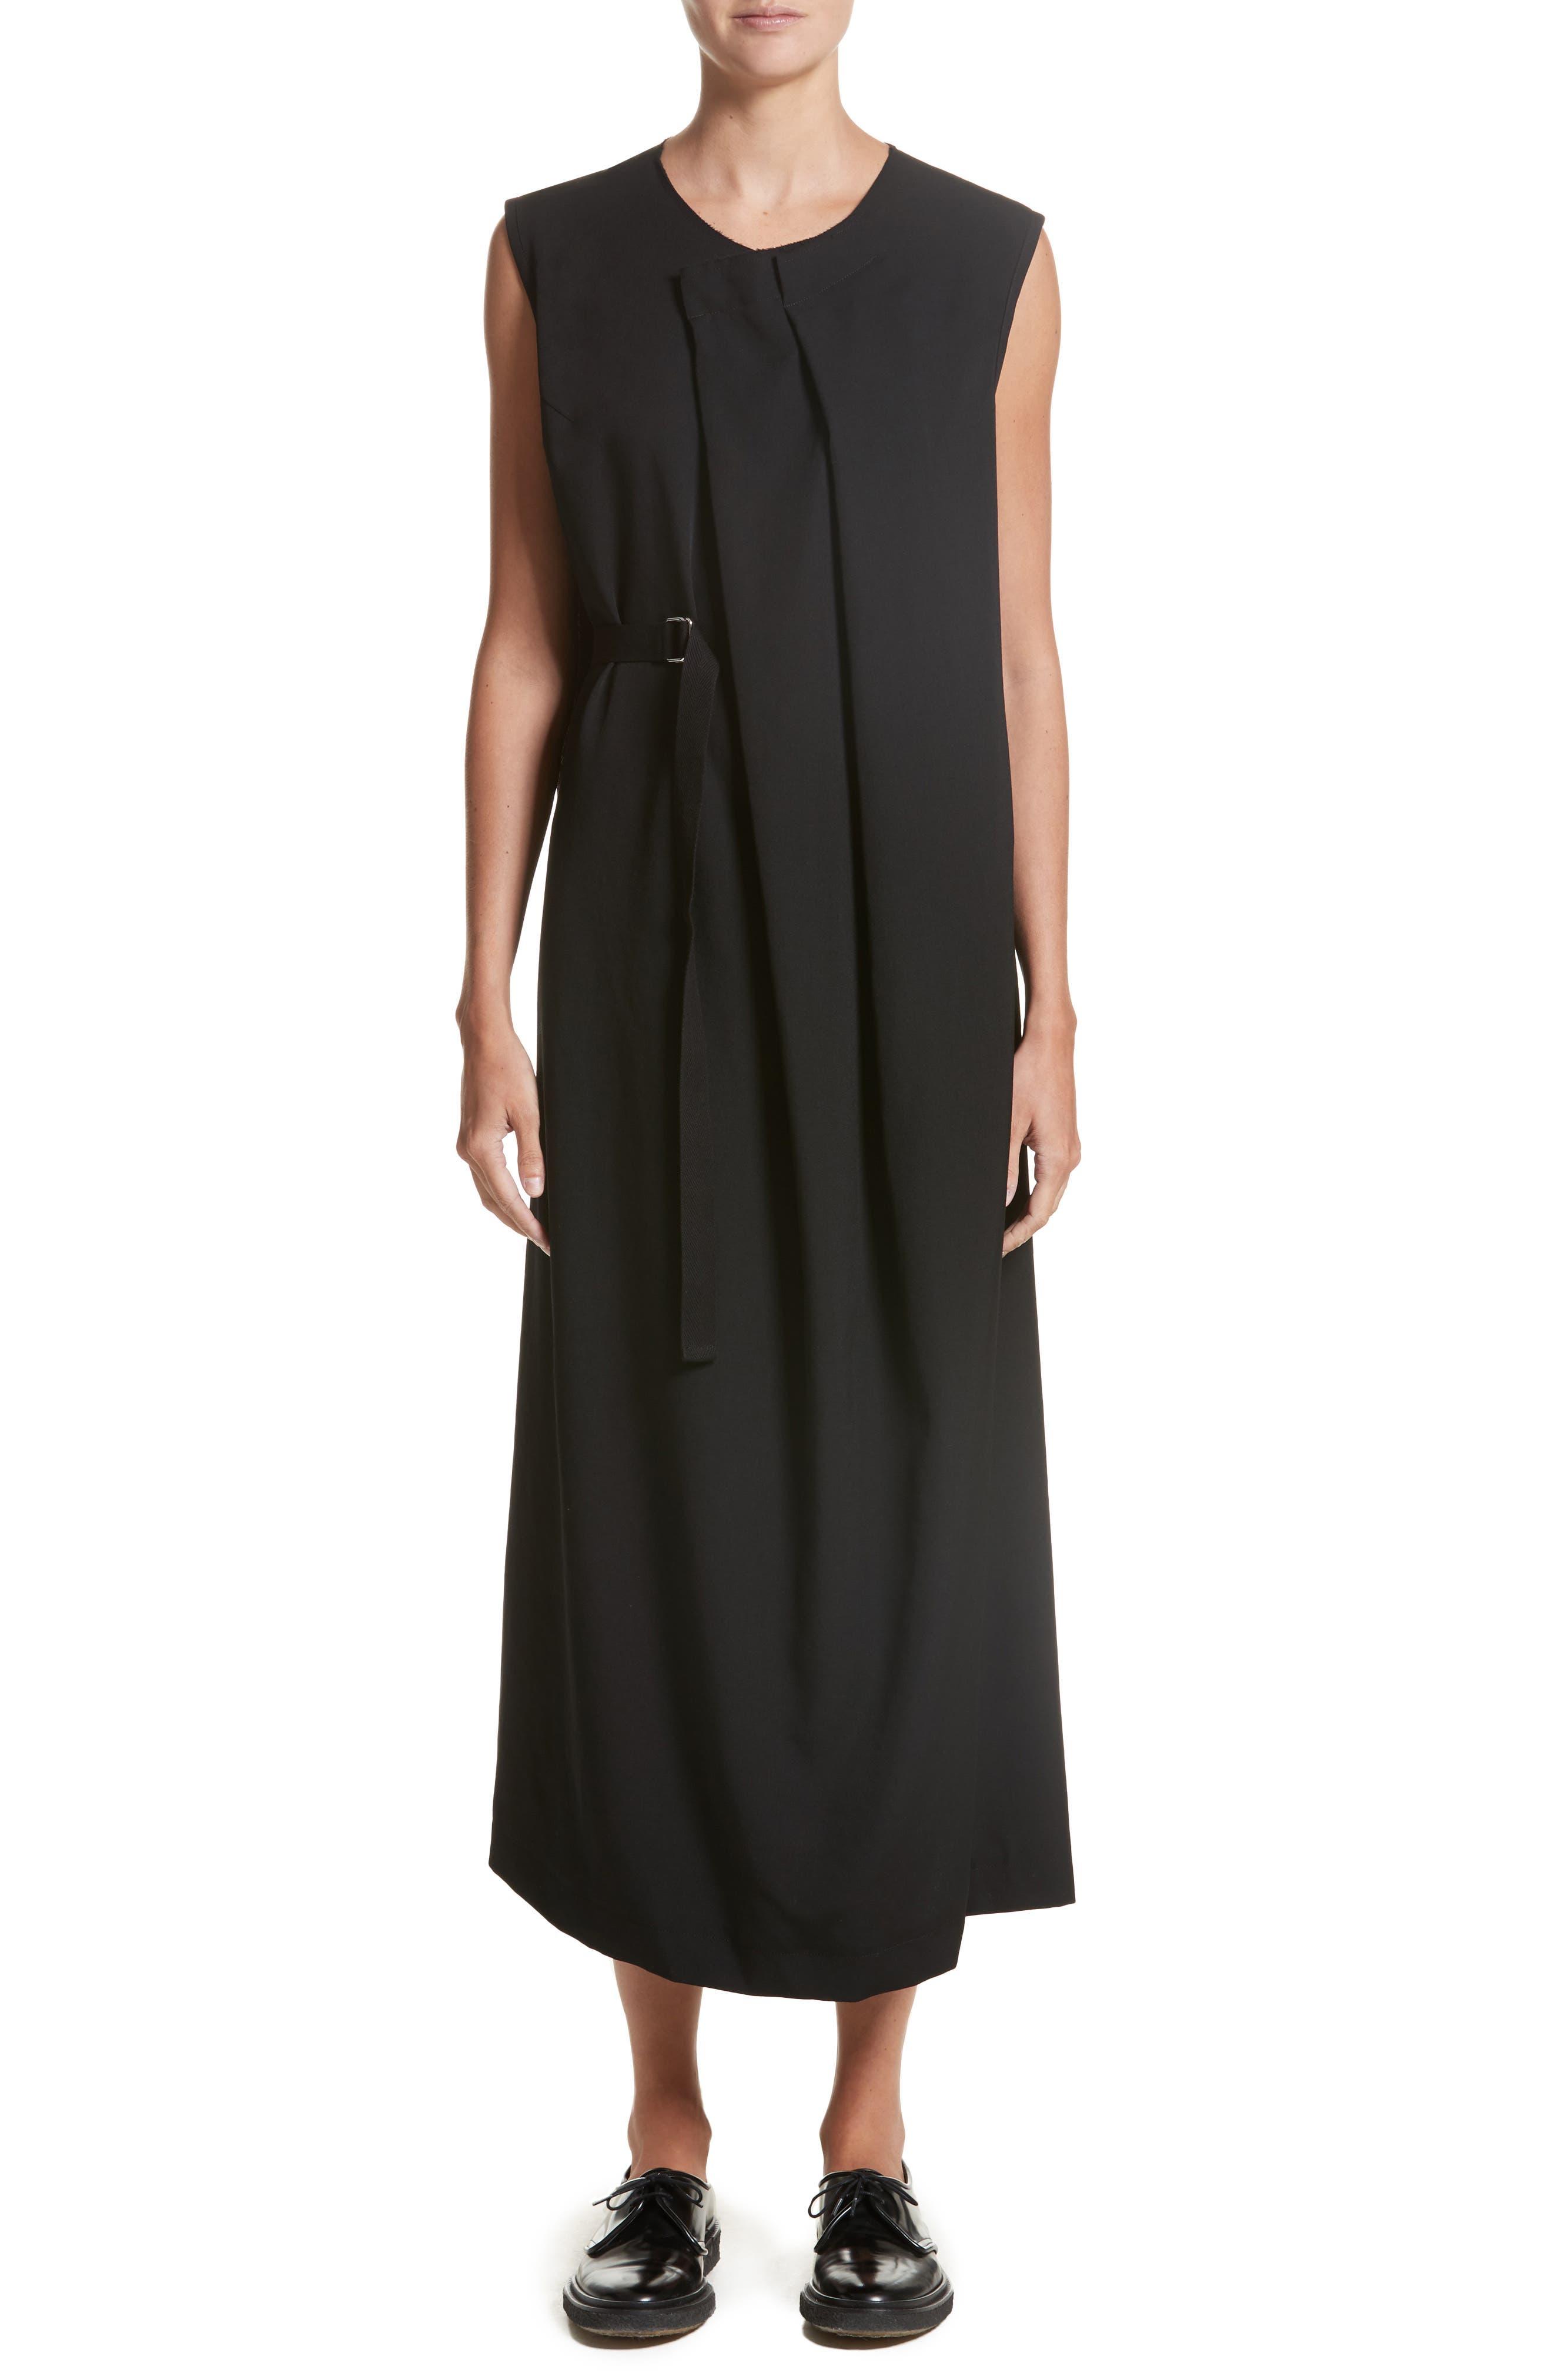 N-F Pleats Dress,                             Main thumbnail 1, color,                             001